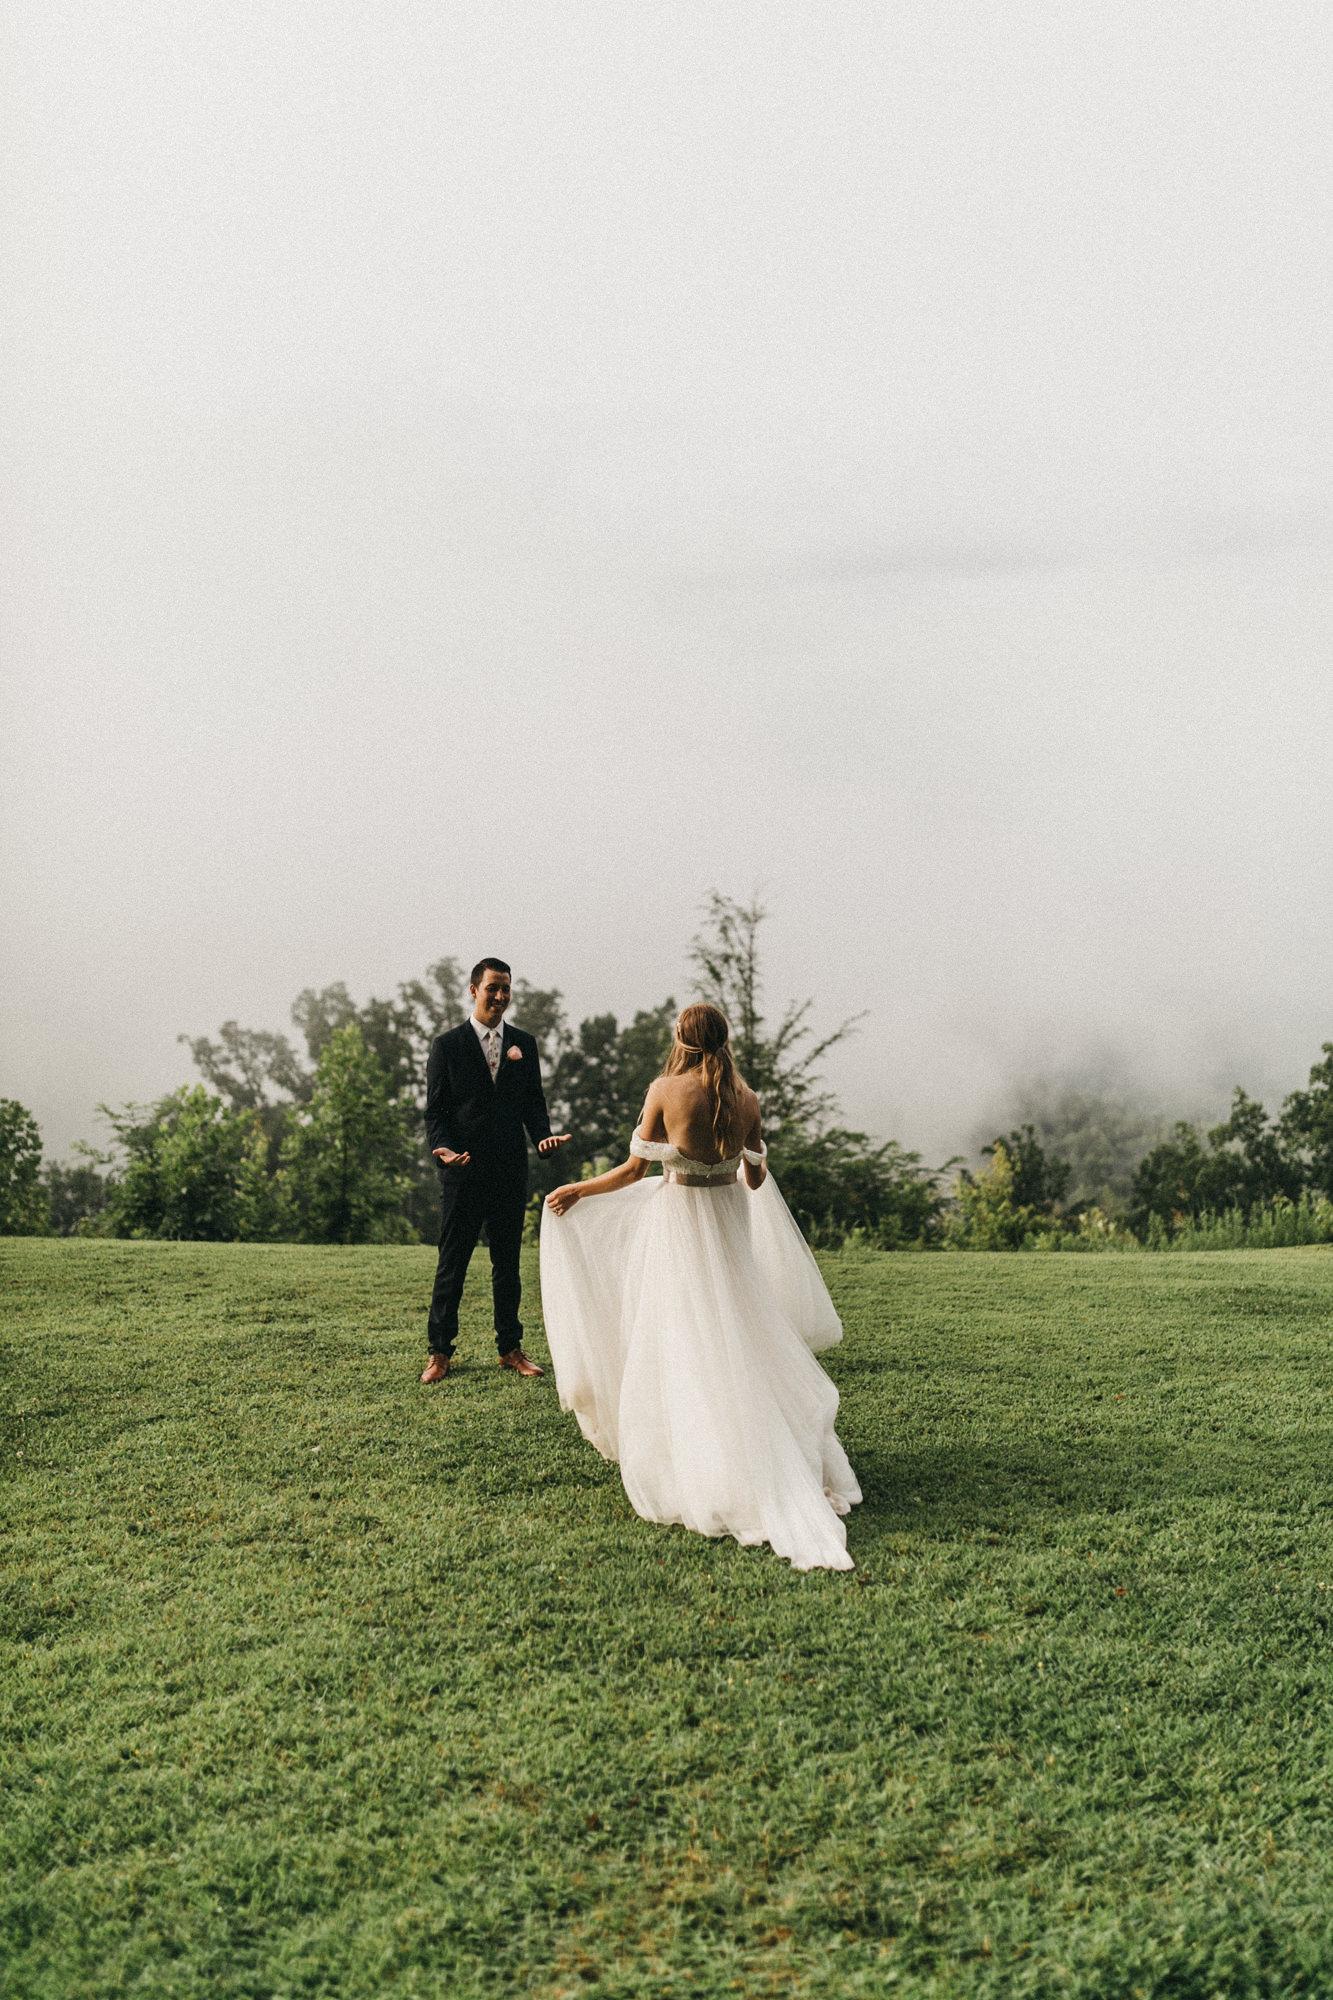 nashville_tennessee_wedding_photographer-131.jpg